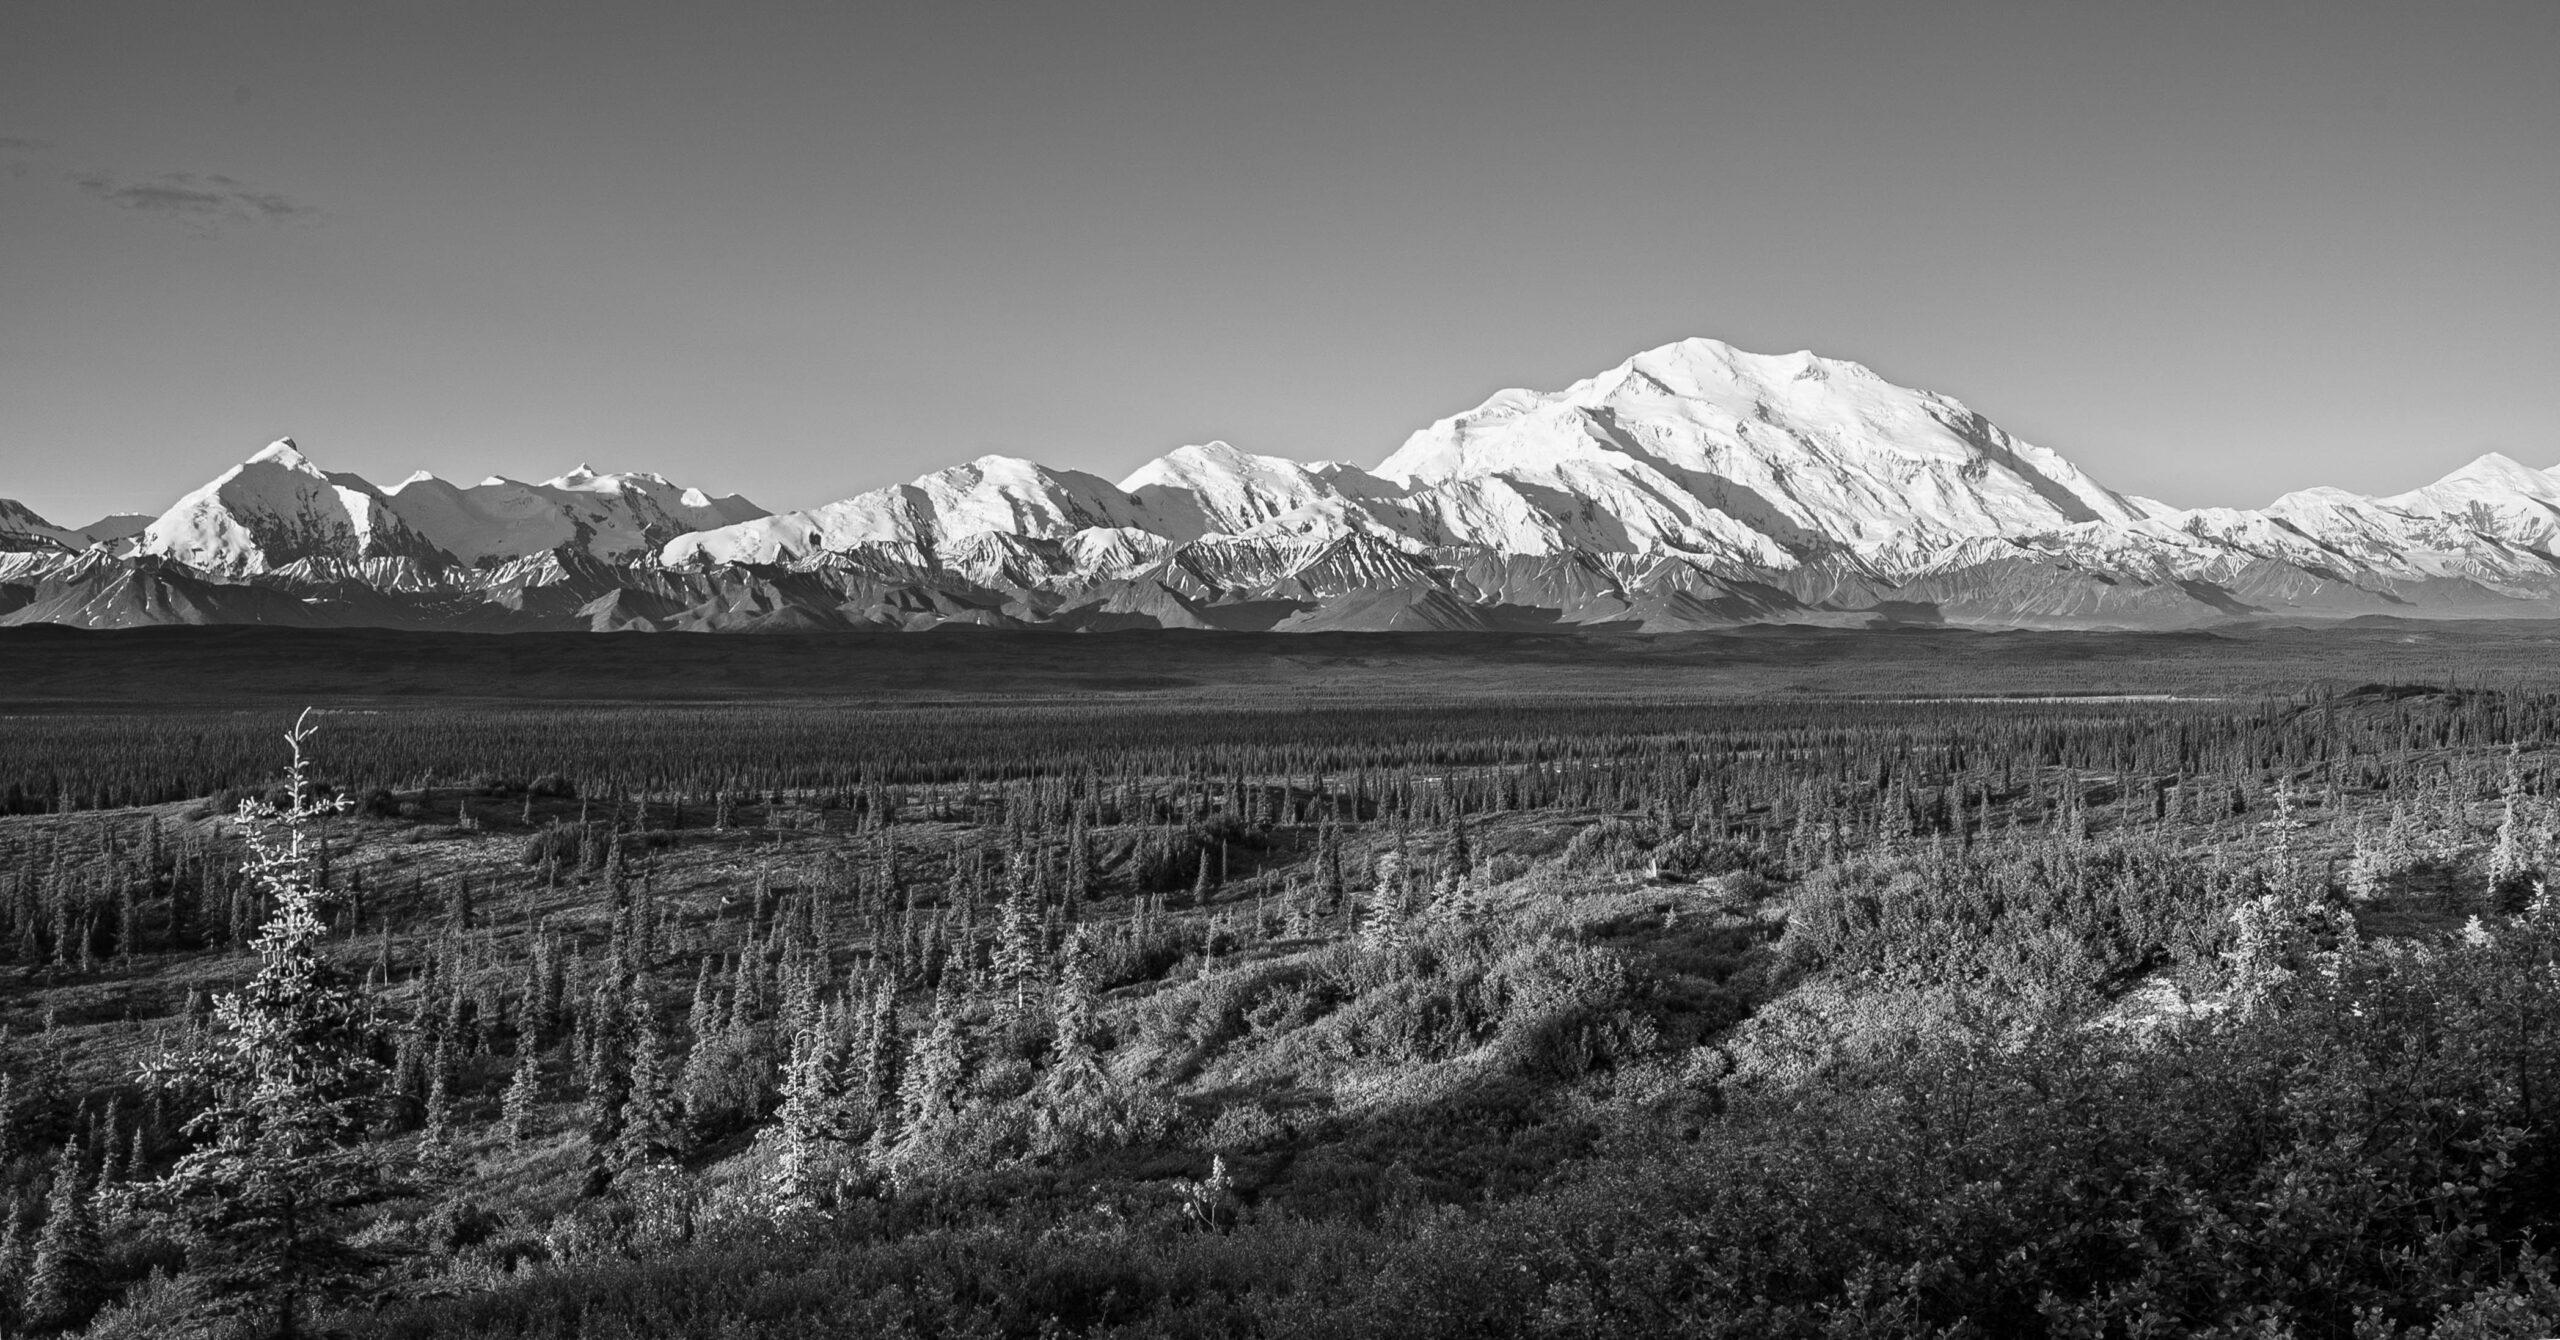 Denali National Park and Homer, Alaska